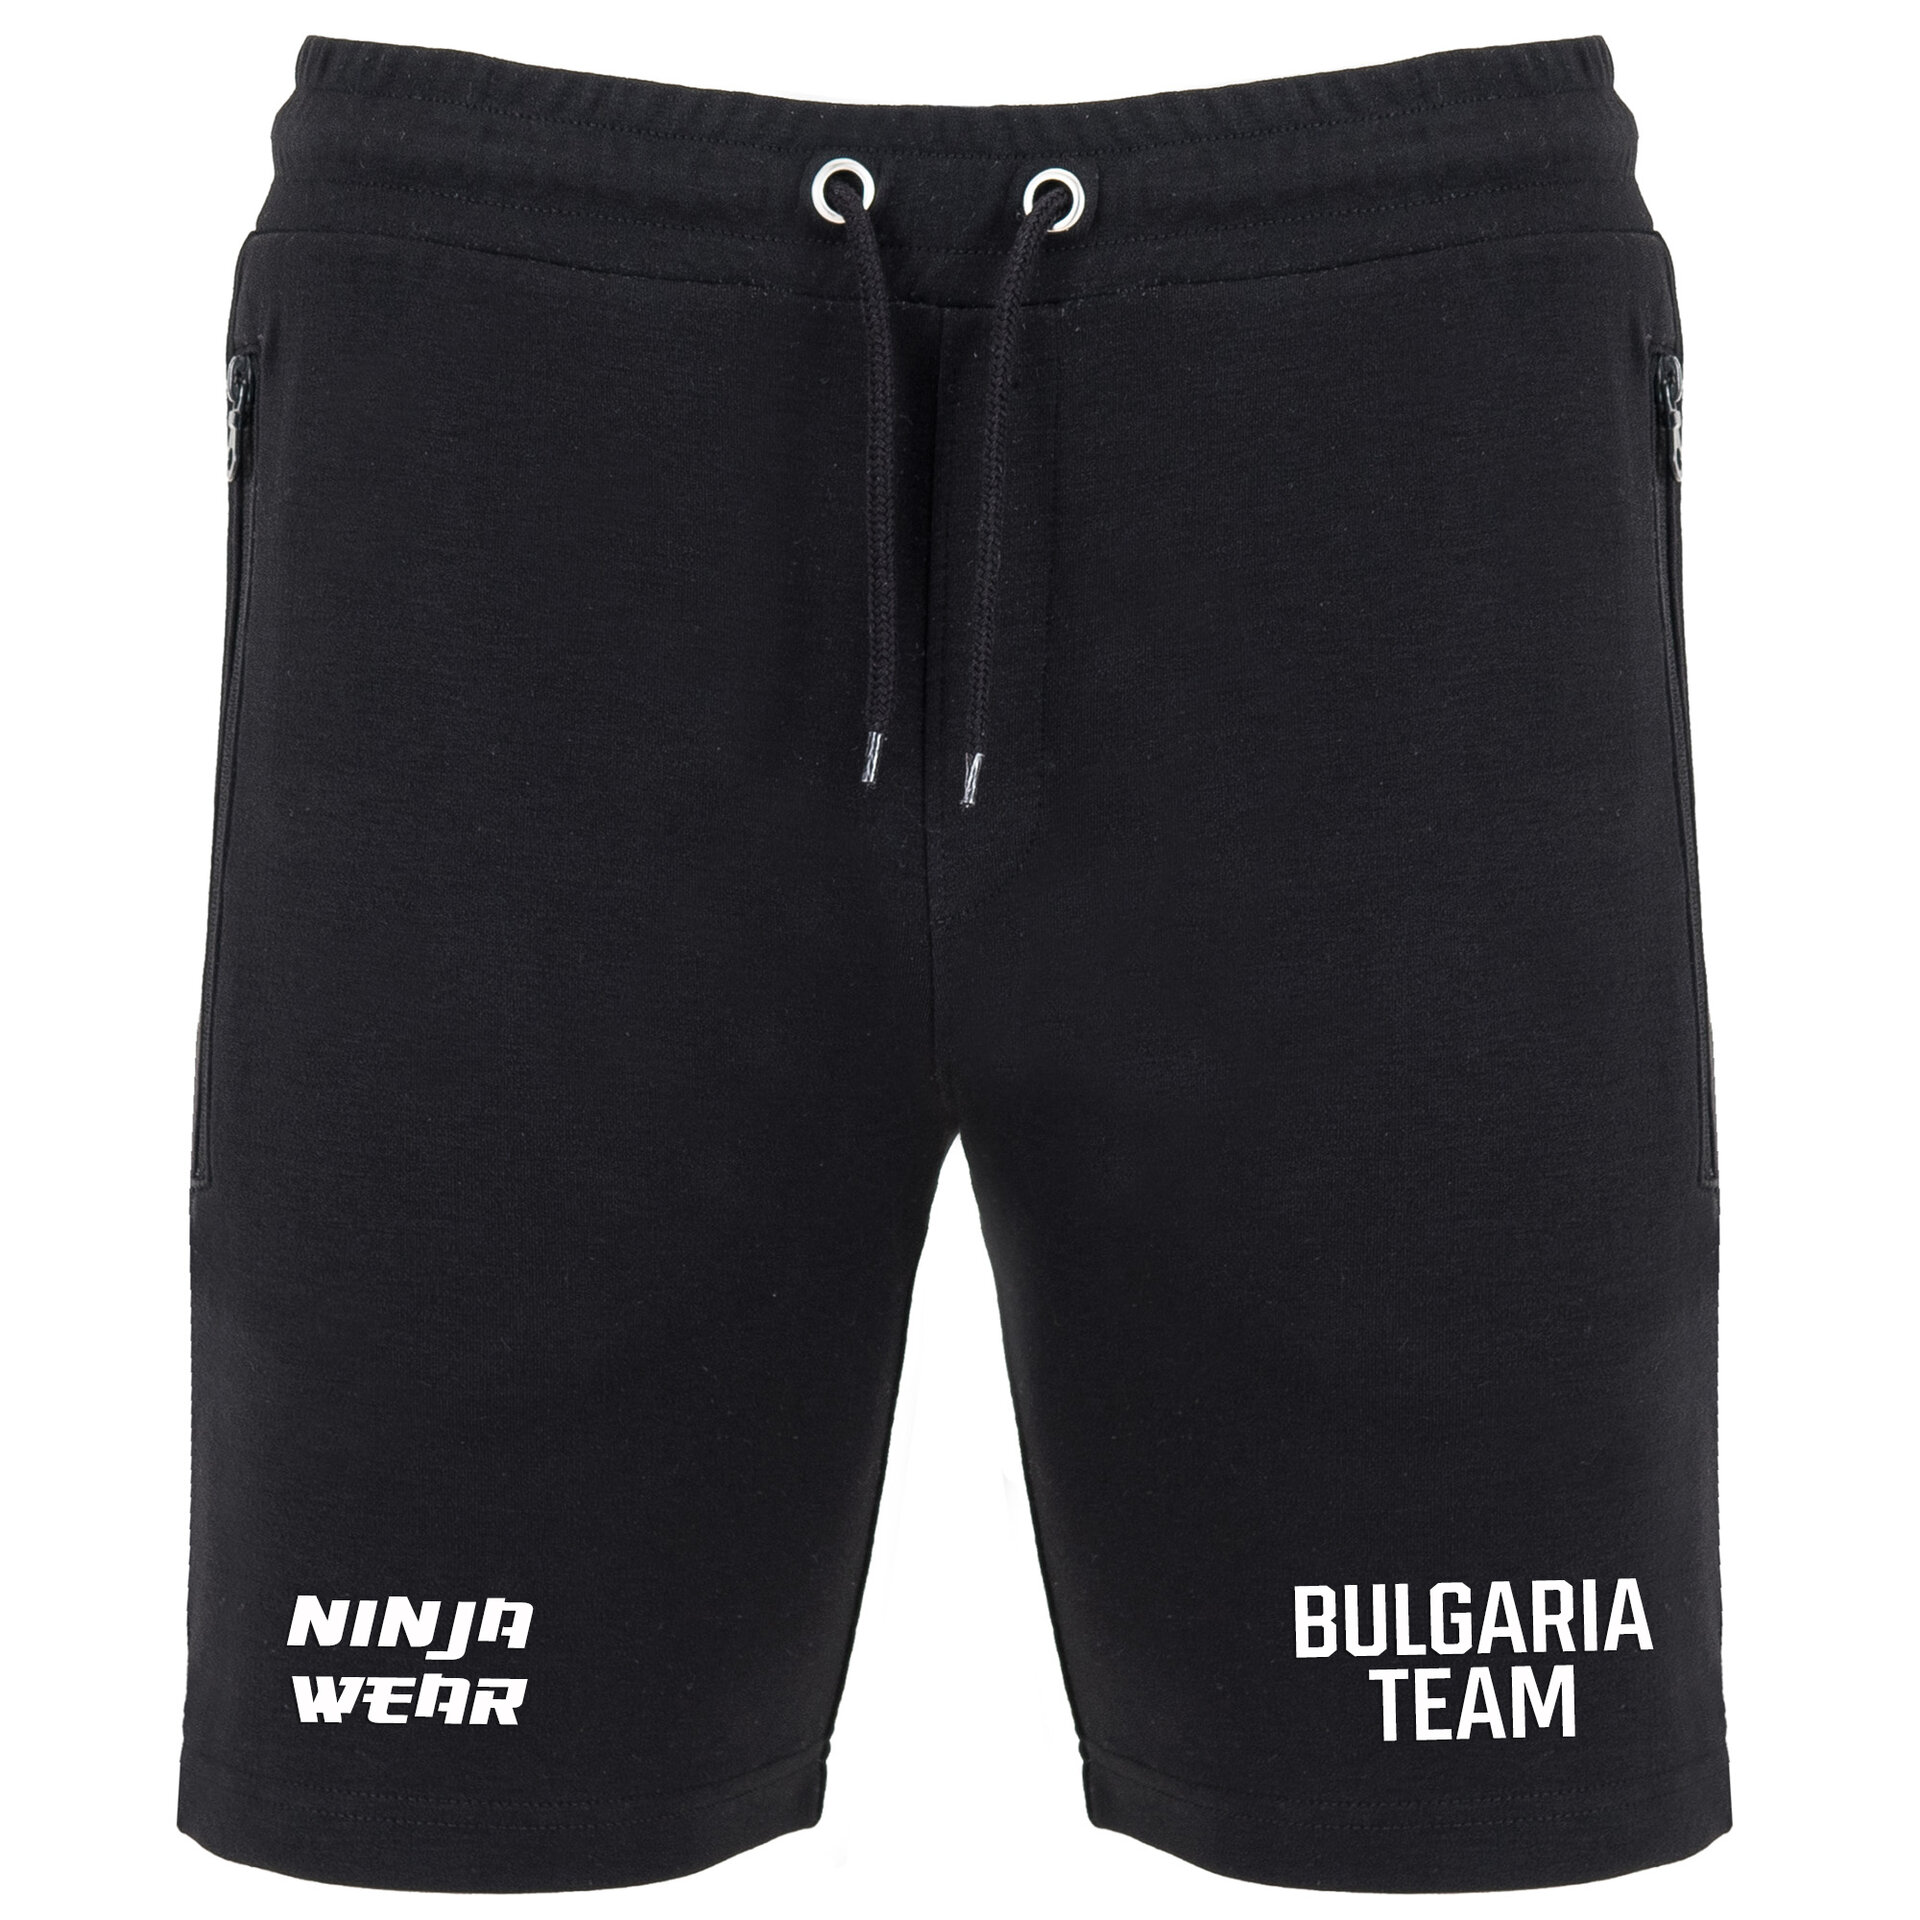 Ninja Wear Шорти - Bulgaria Team - Черни